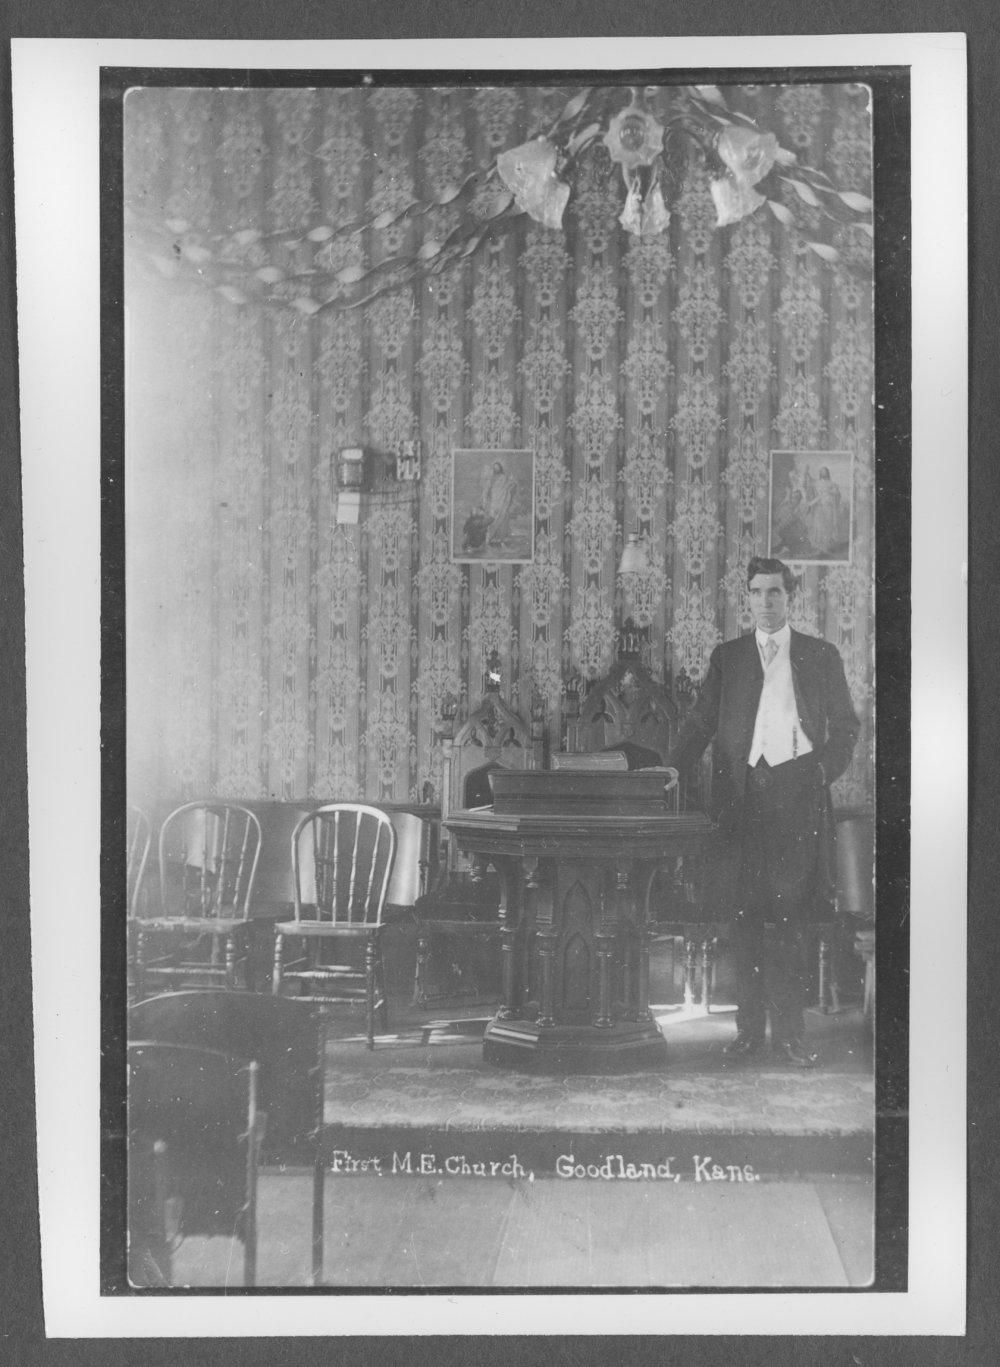 Scenes of Sherman County, Kansas - An unidentified man inside the Methodist Episcopal Church.